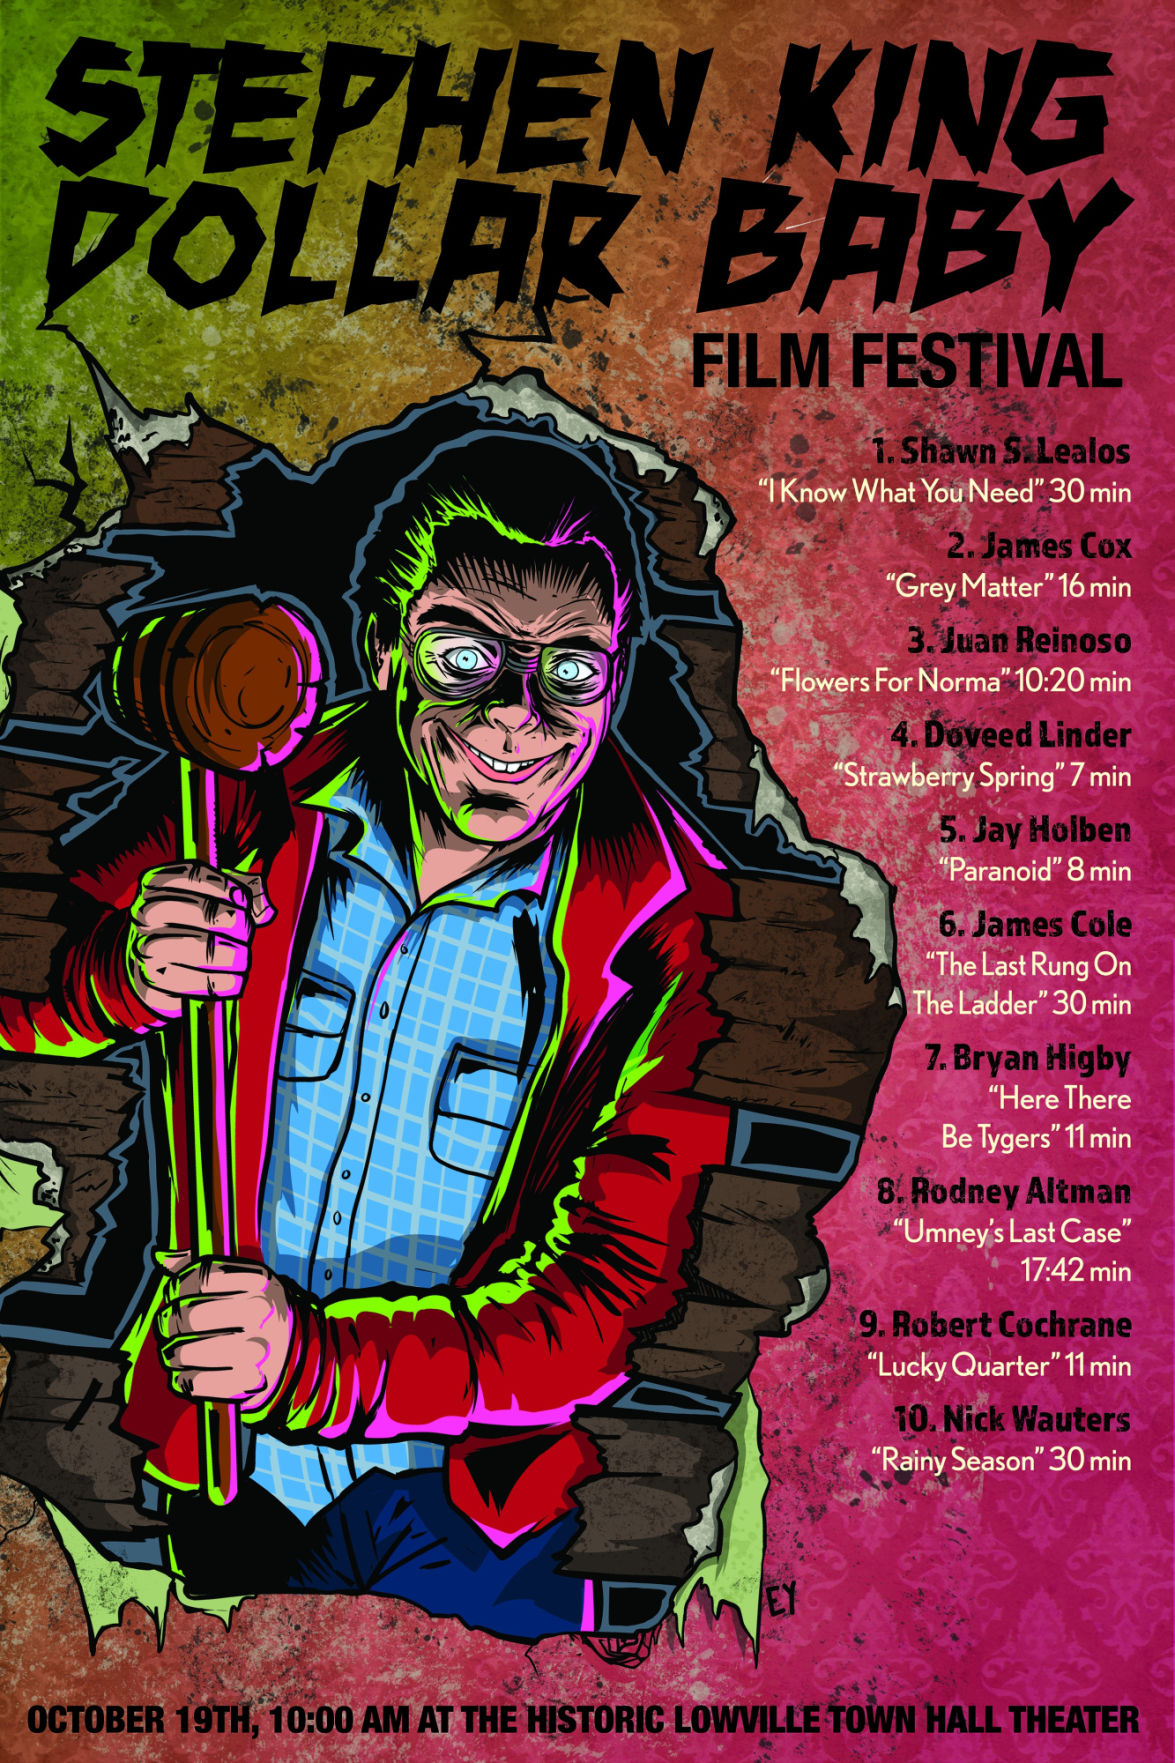 Stephen King film fest set in Lowville